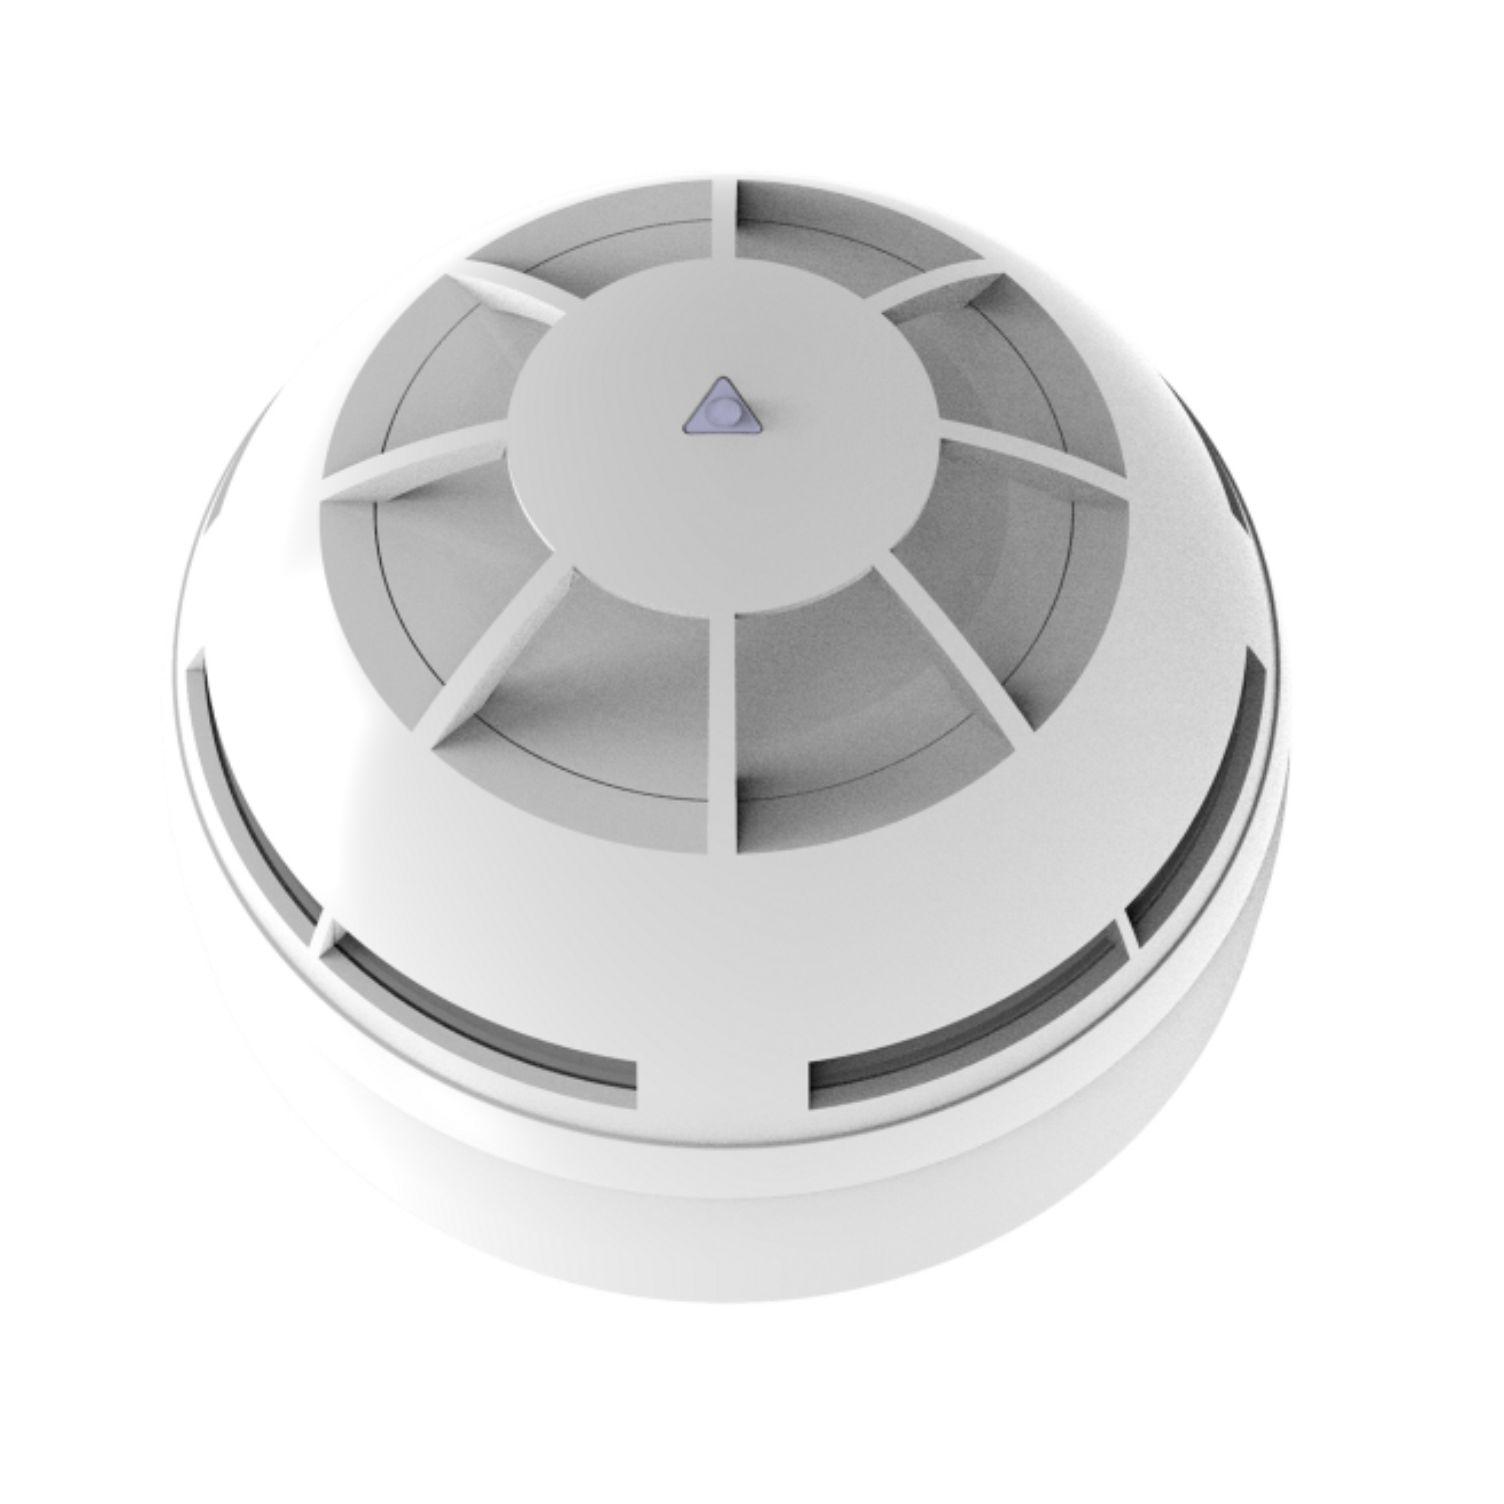 EKHO Hybrid Wireless Multi-Sensor